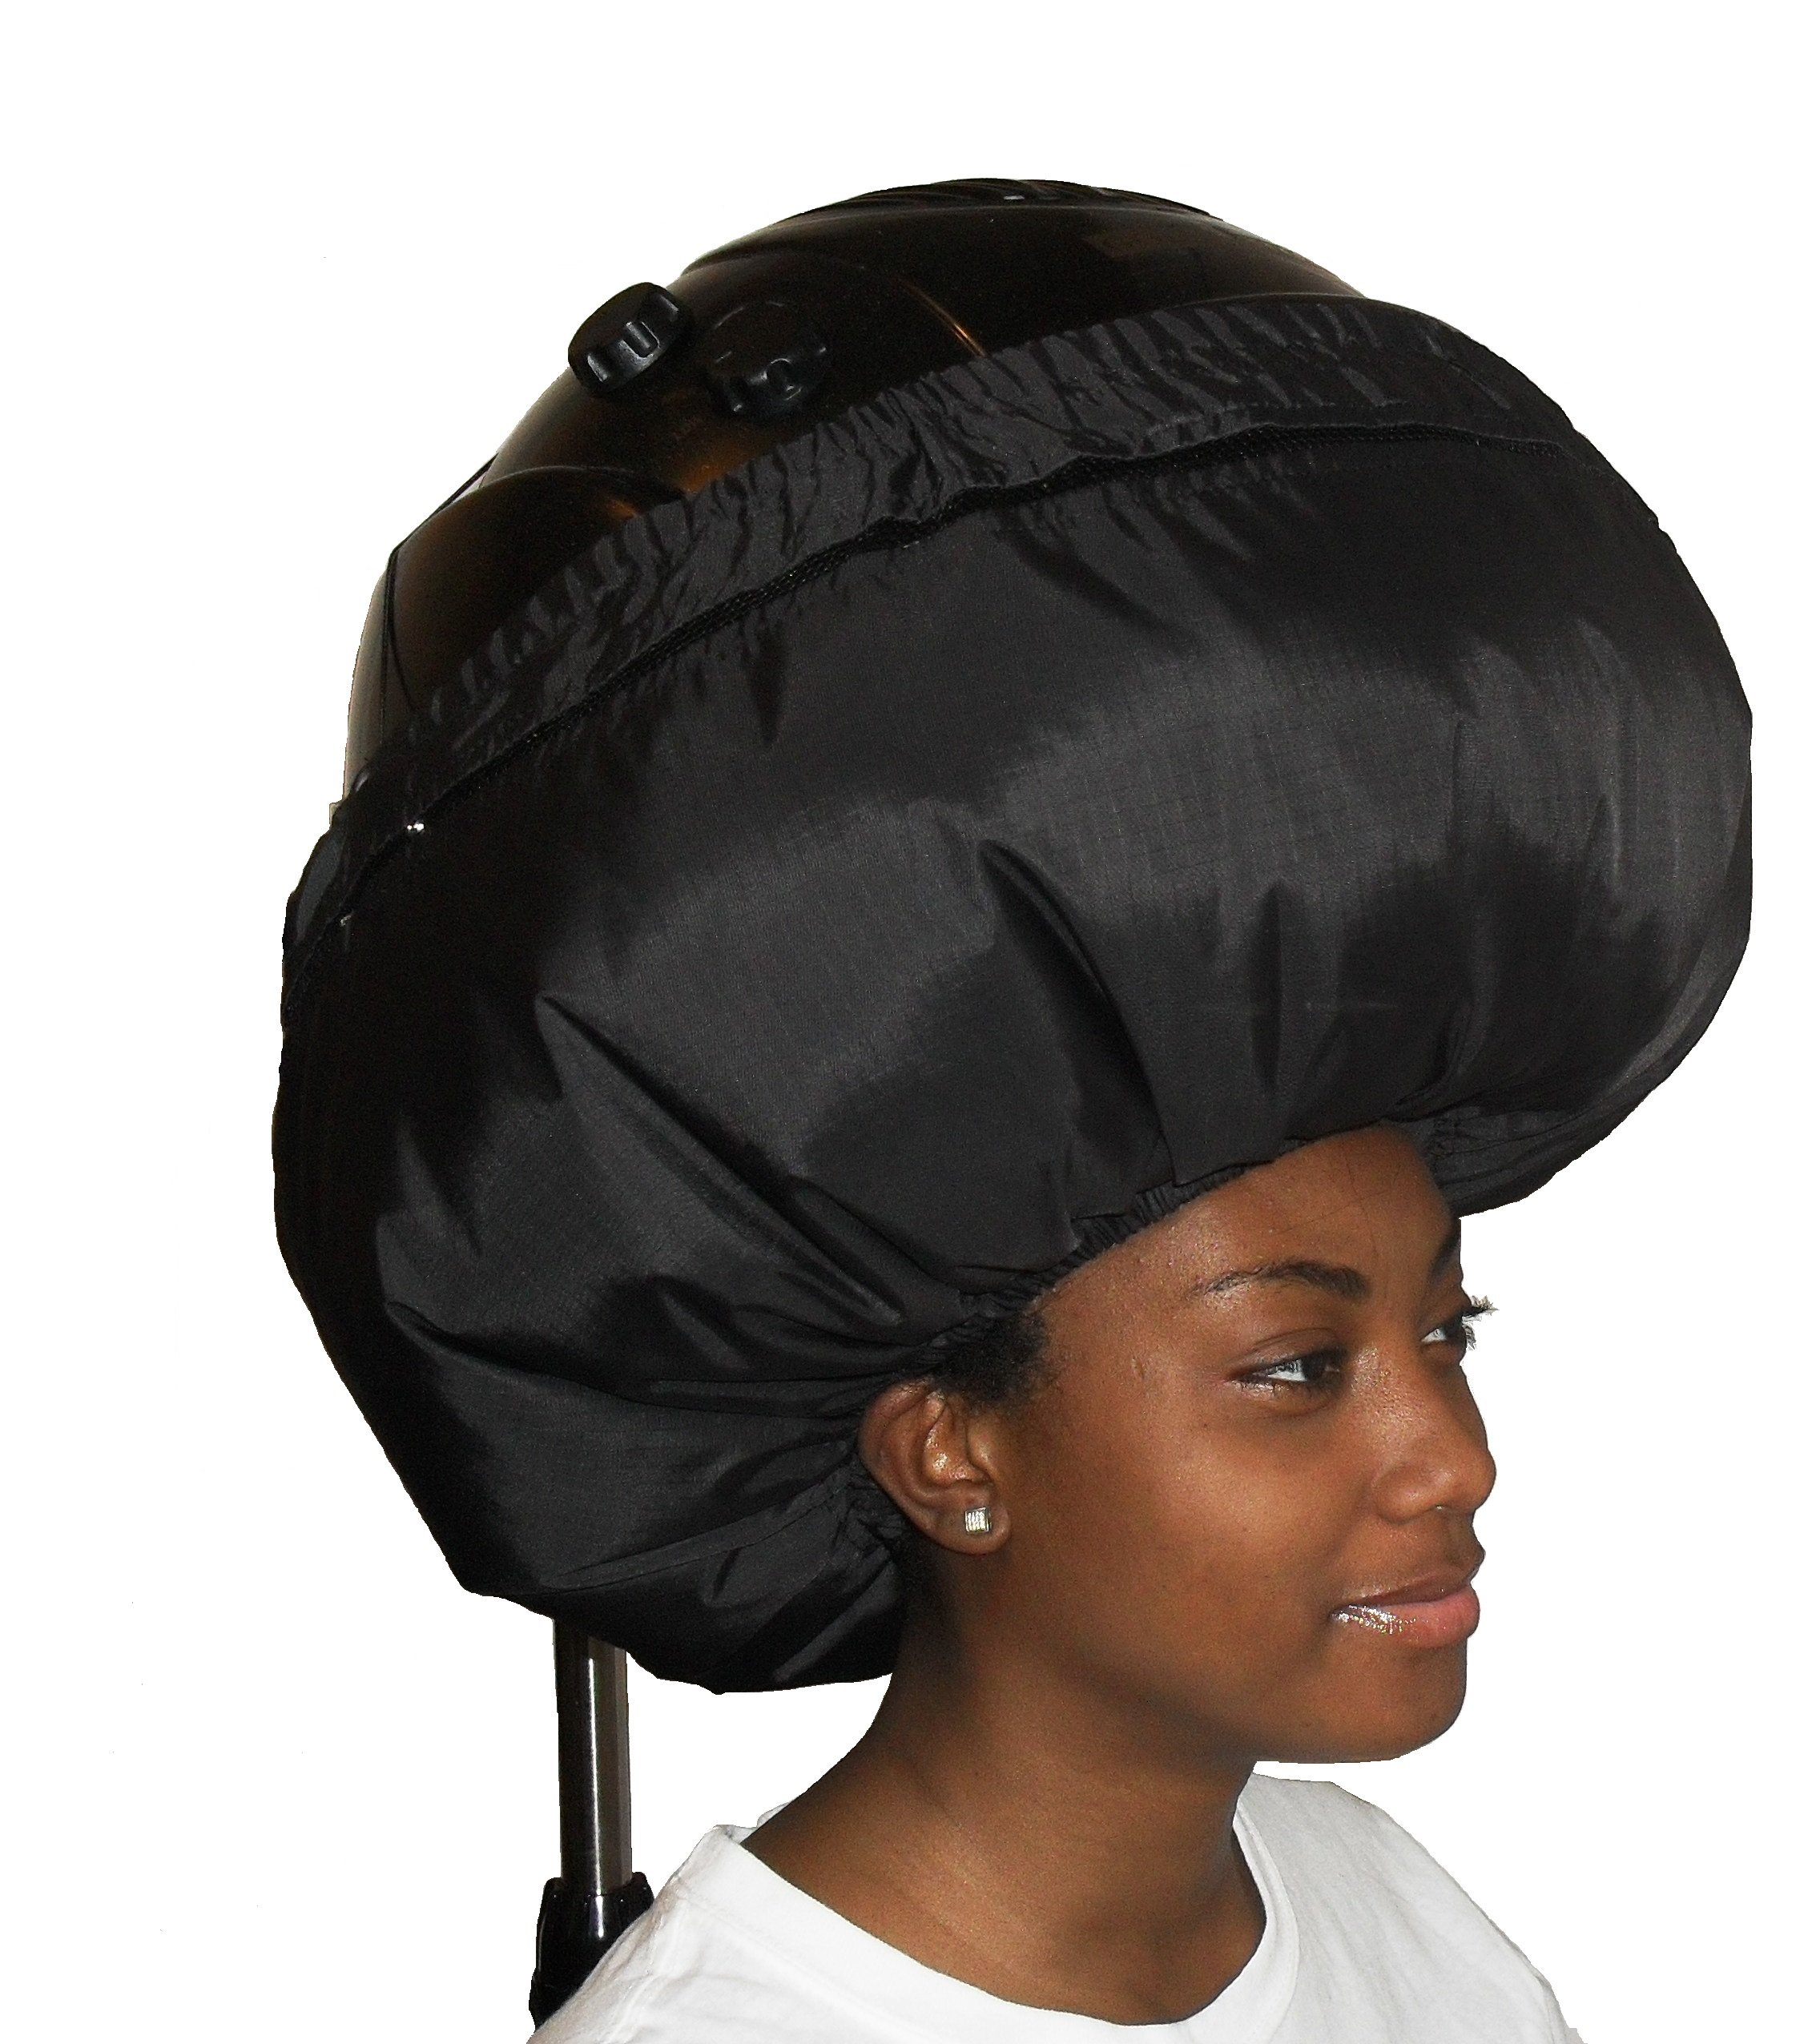 Cool Cap Bonnet Soft Nylon Hood Hair Dryer Attachment (Hair dryer not included)